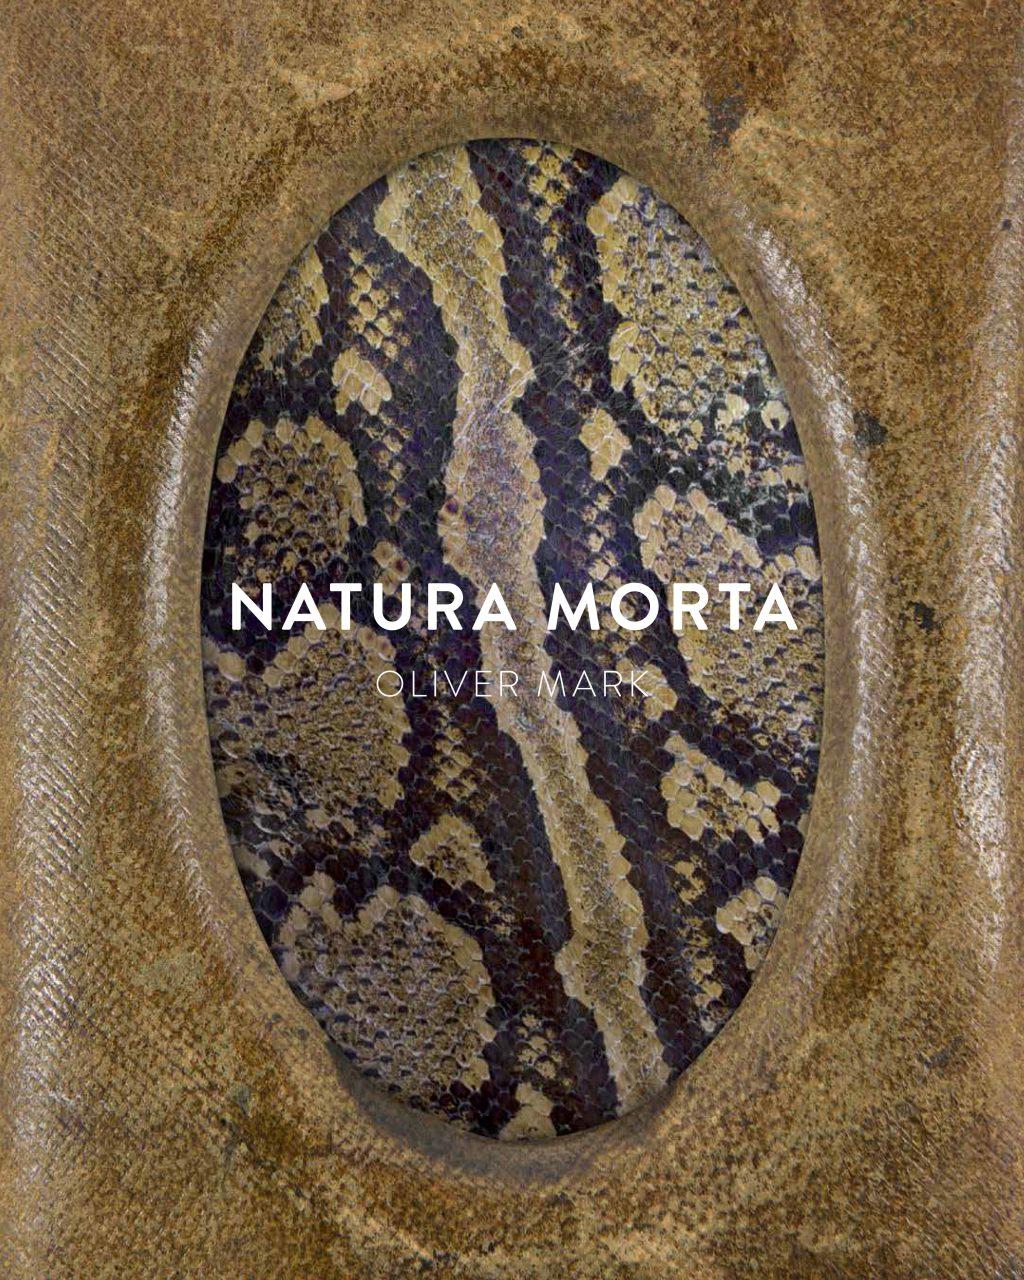 new book  Natura Morta Oliver Mark